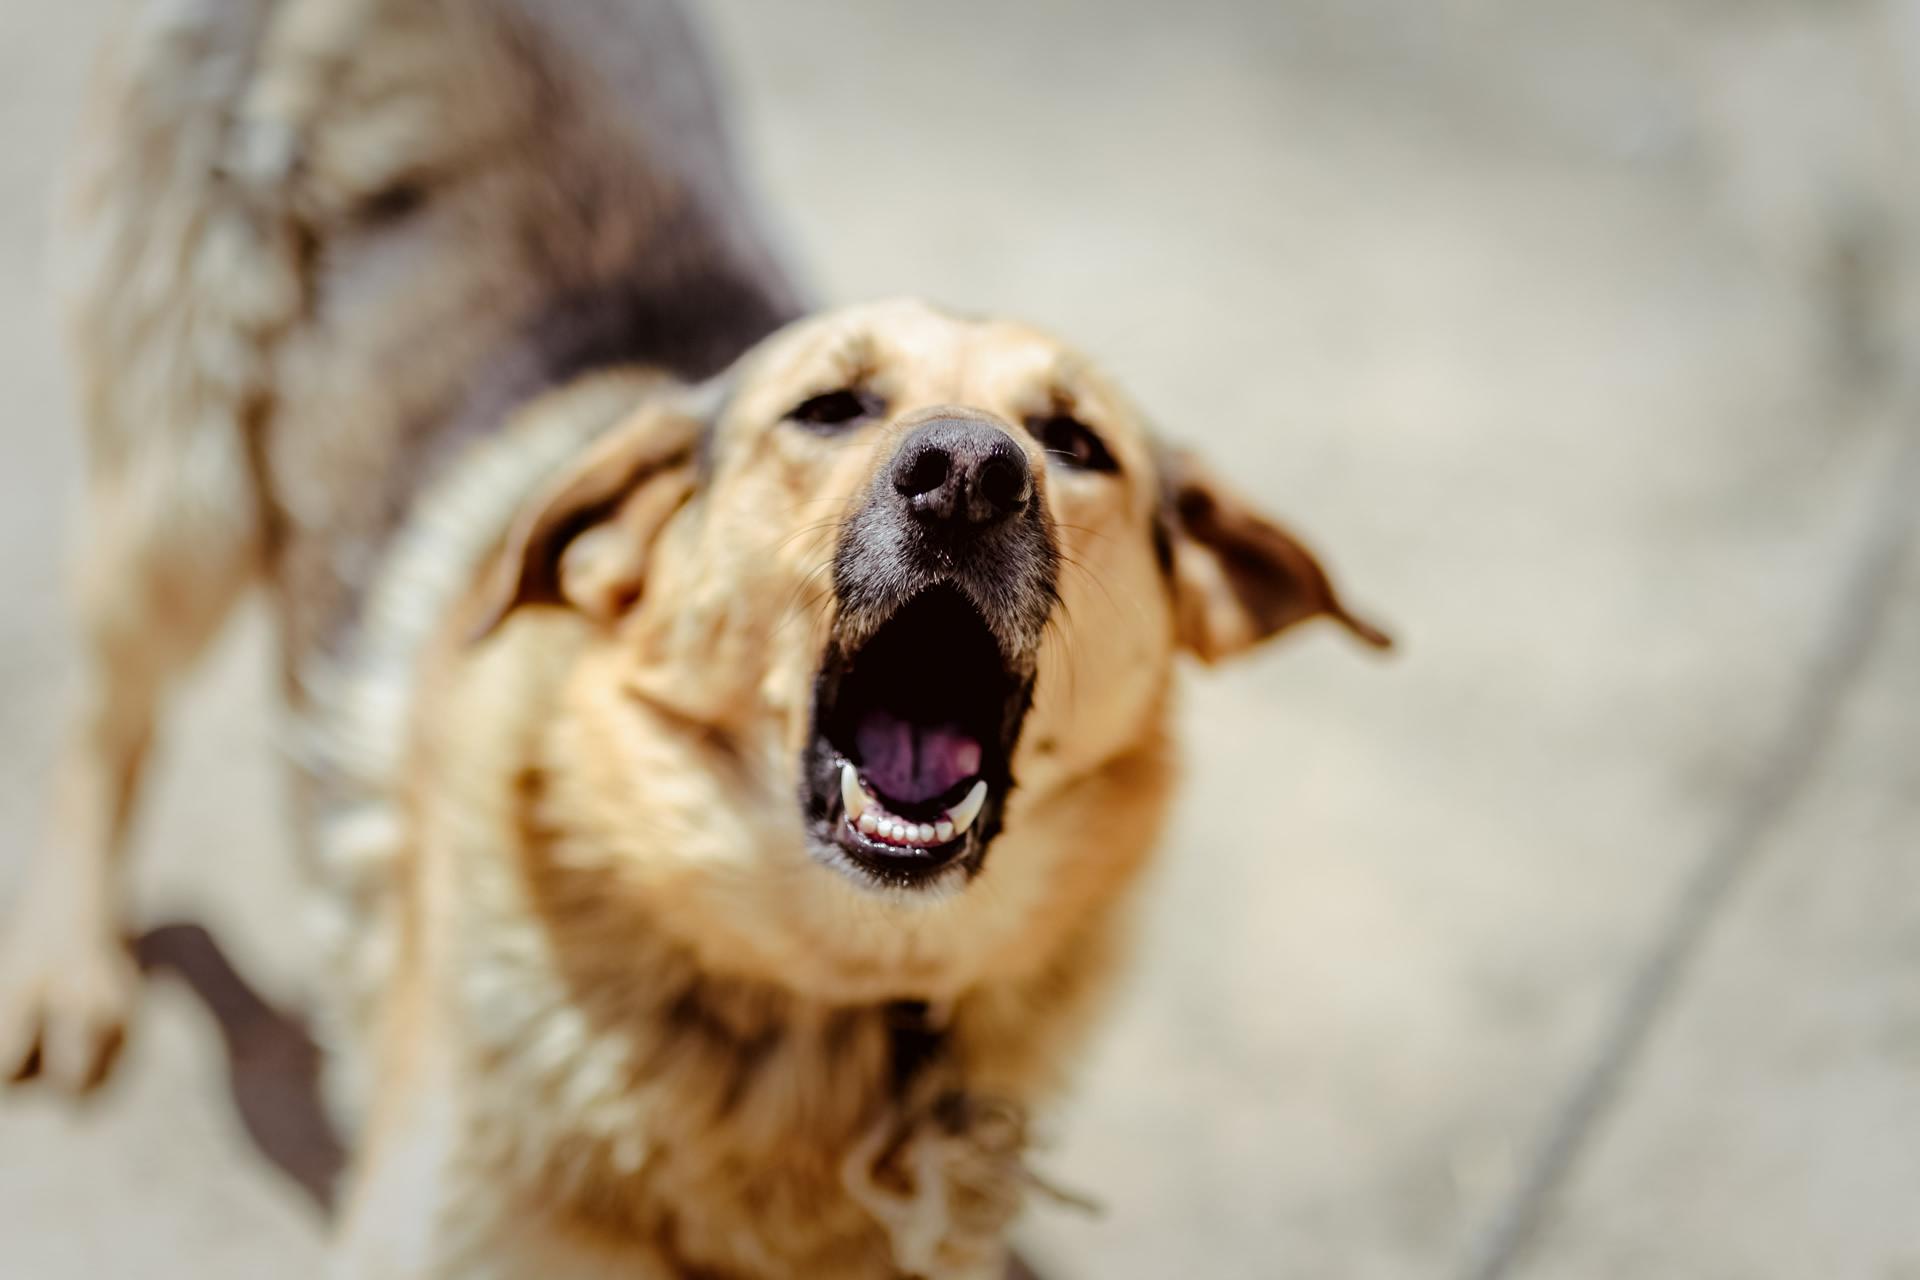 Flower essences for aggressive, reactive dog behavior